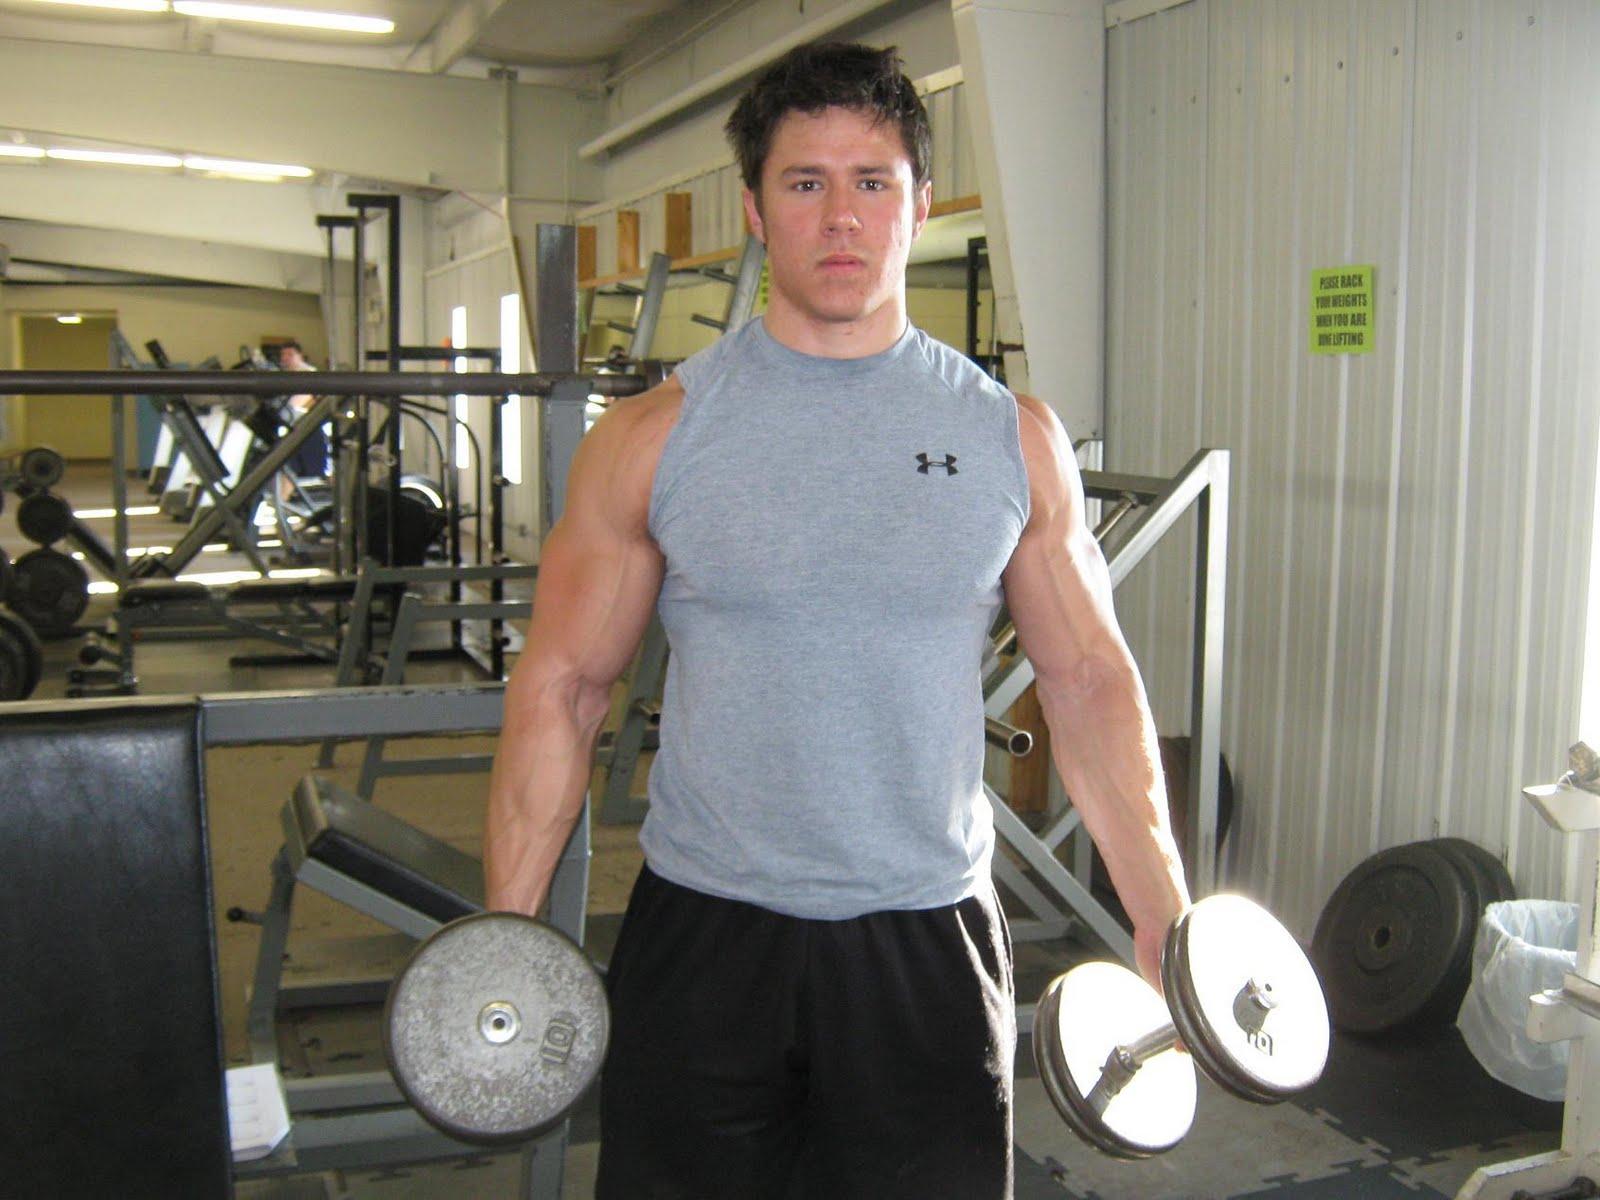 http://2.bp.blogspot.com/_cw3nwHF2m1g/S87uHIk5UnI/AAAAAAAAPN8/_4oaksFIt8k/s1600/gym1.jpg